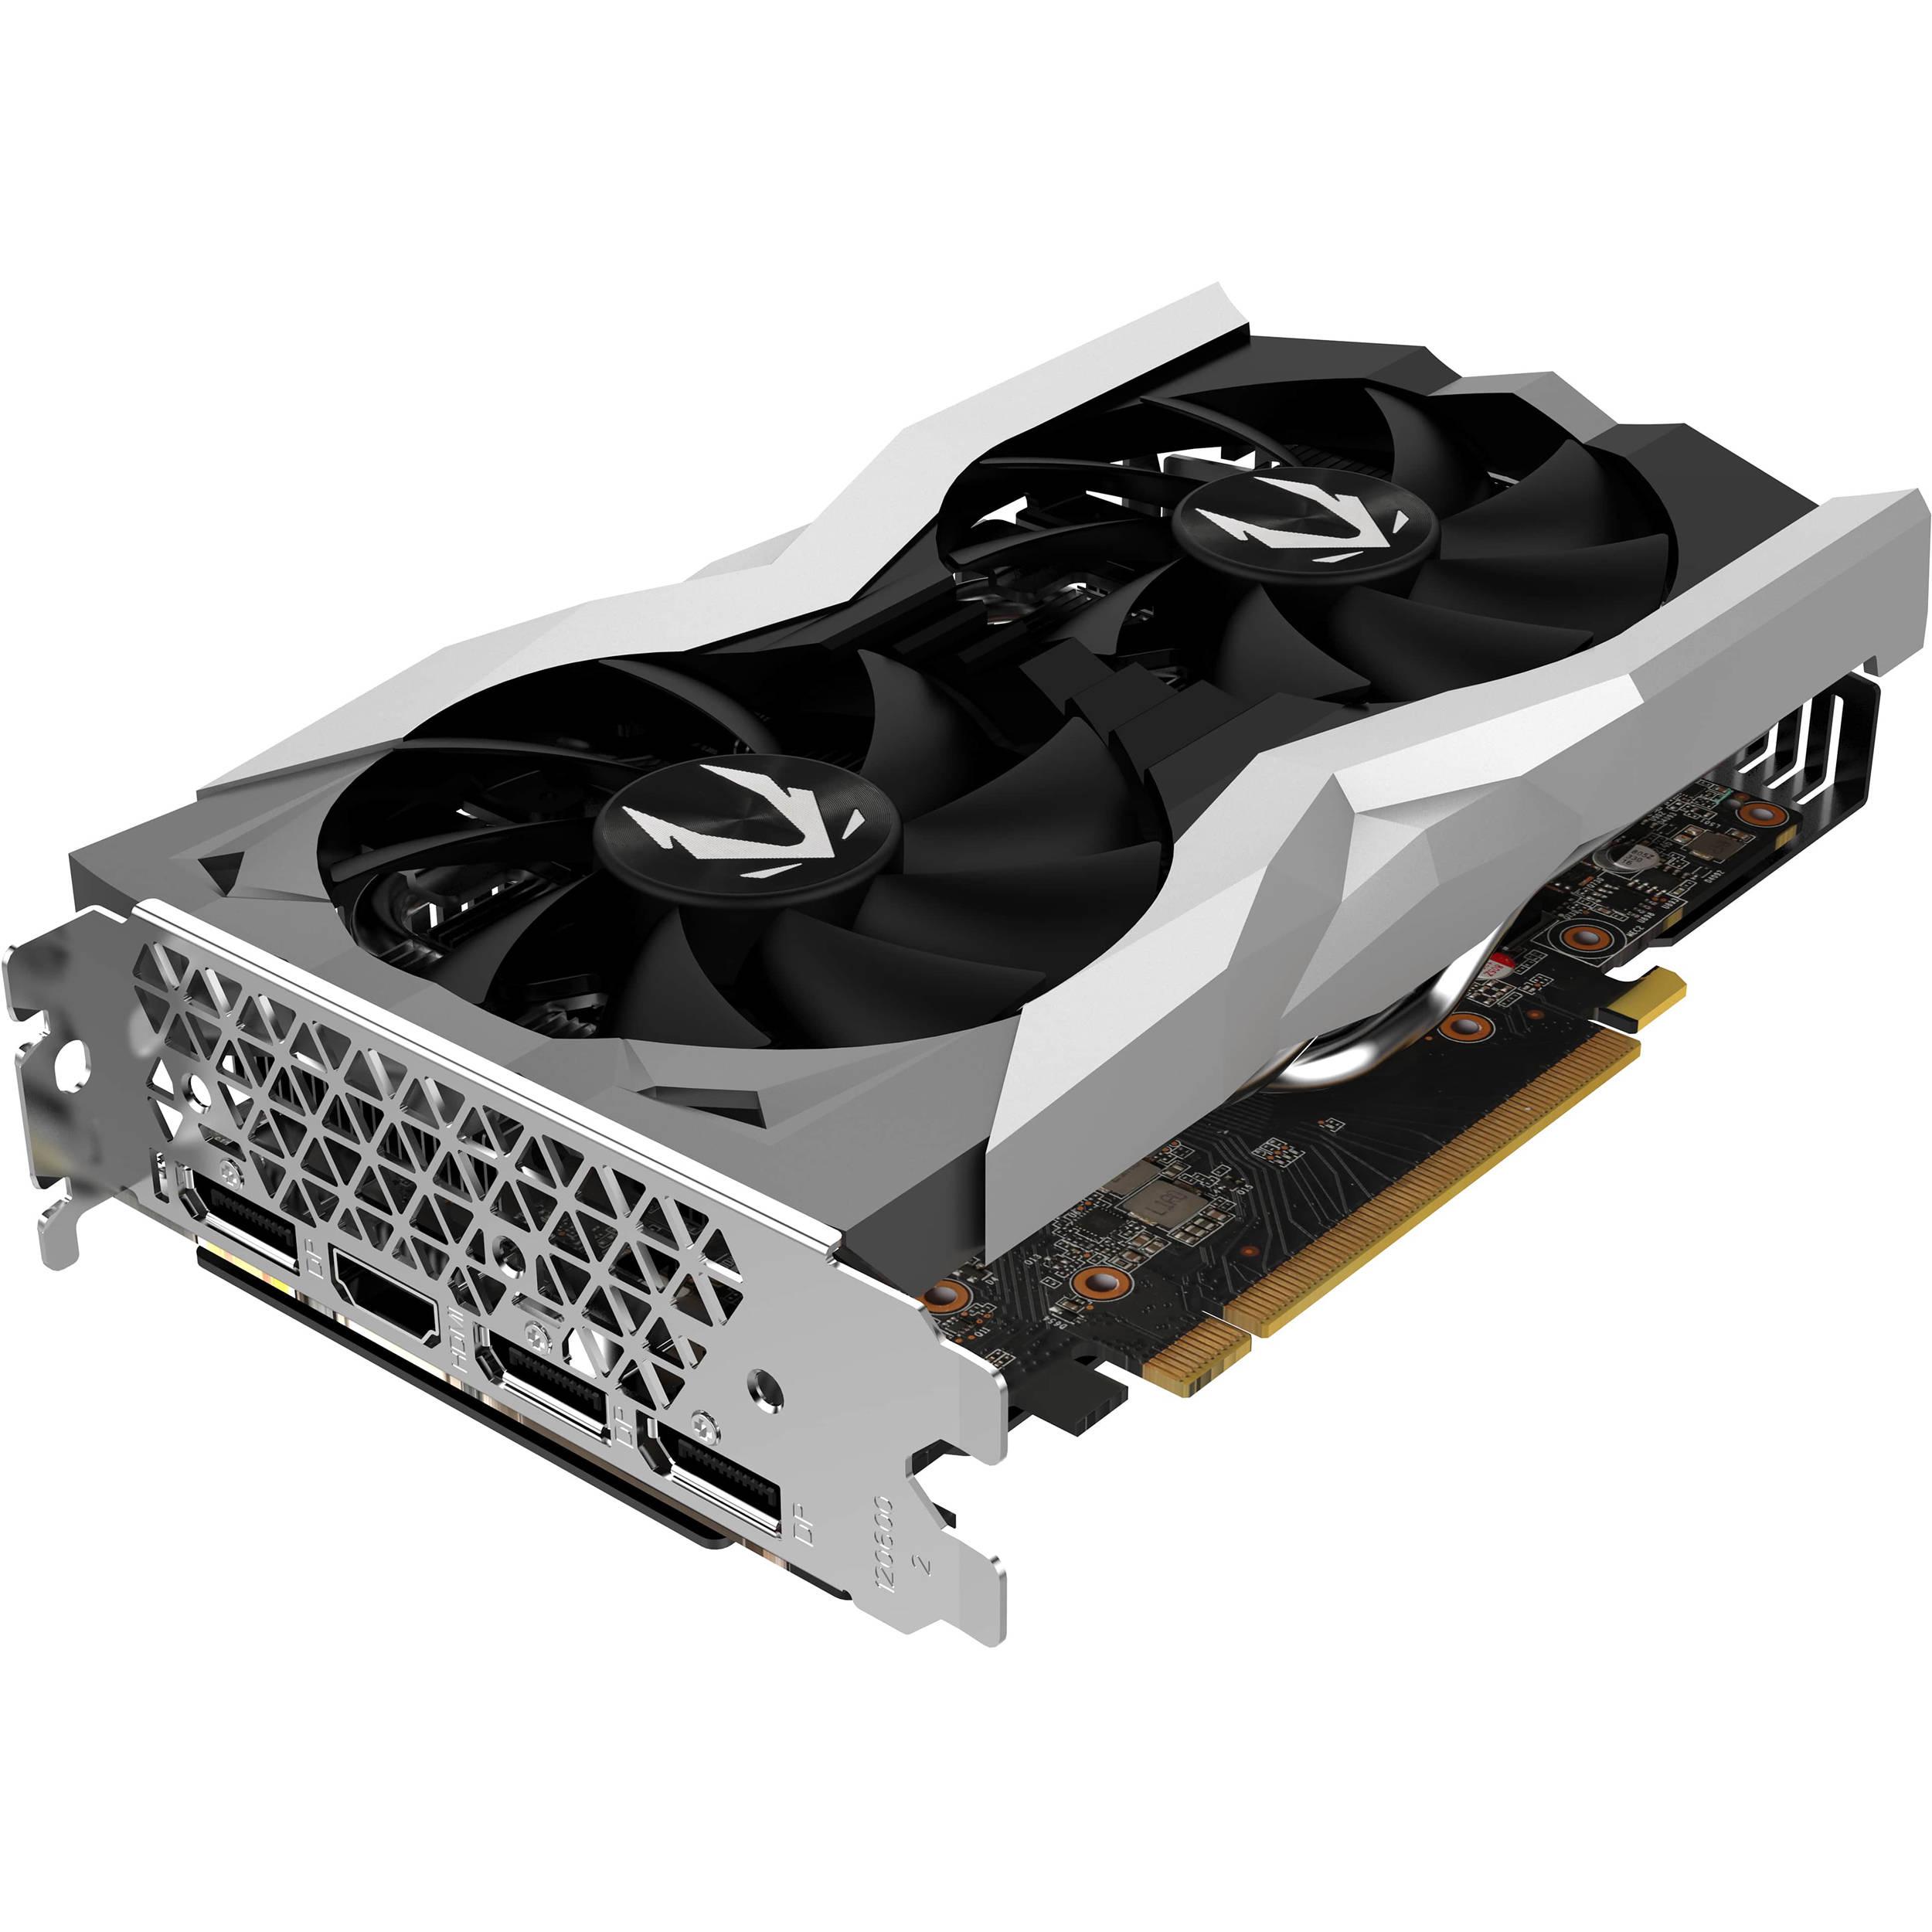 ZOTAC GAMING GEFORCE RTX2060, 6GB GDDR6, 192 bit, 1680/14000, HDCP, Three DP, HDMI, Medium pack